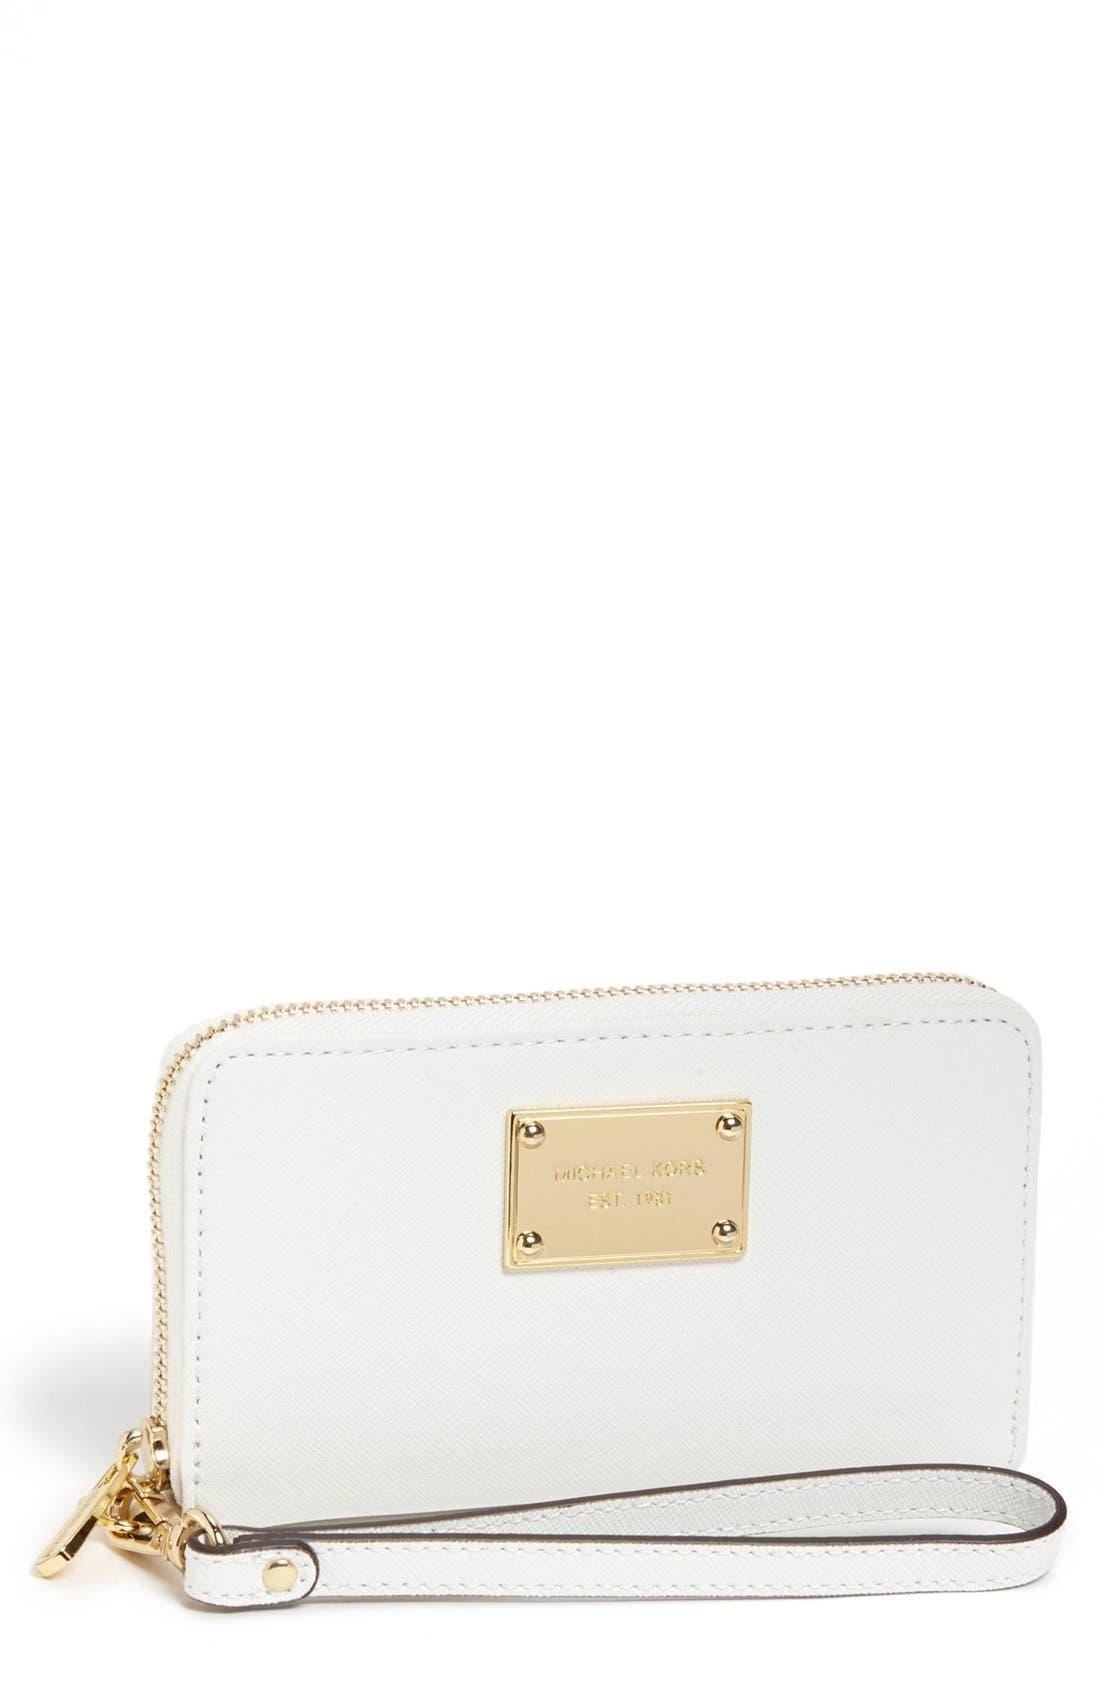 Main Image - MICHAEL Michael Kors 'Saffiano' Phone Wallet